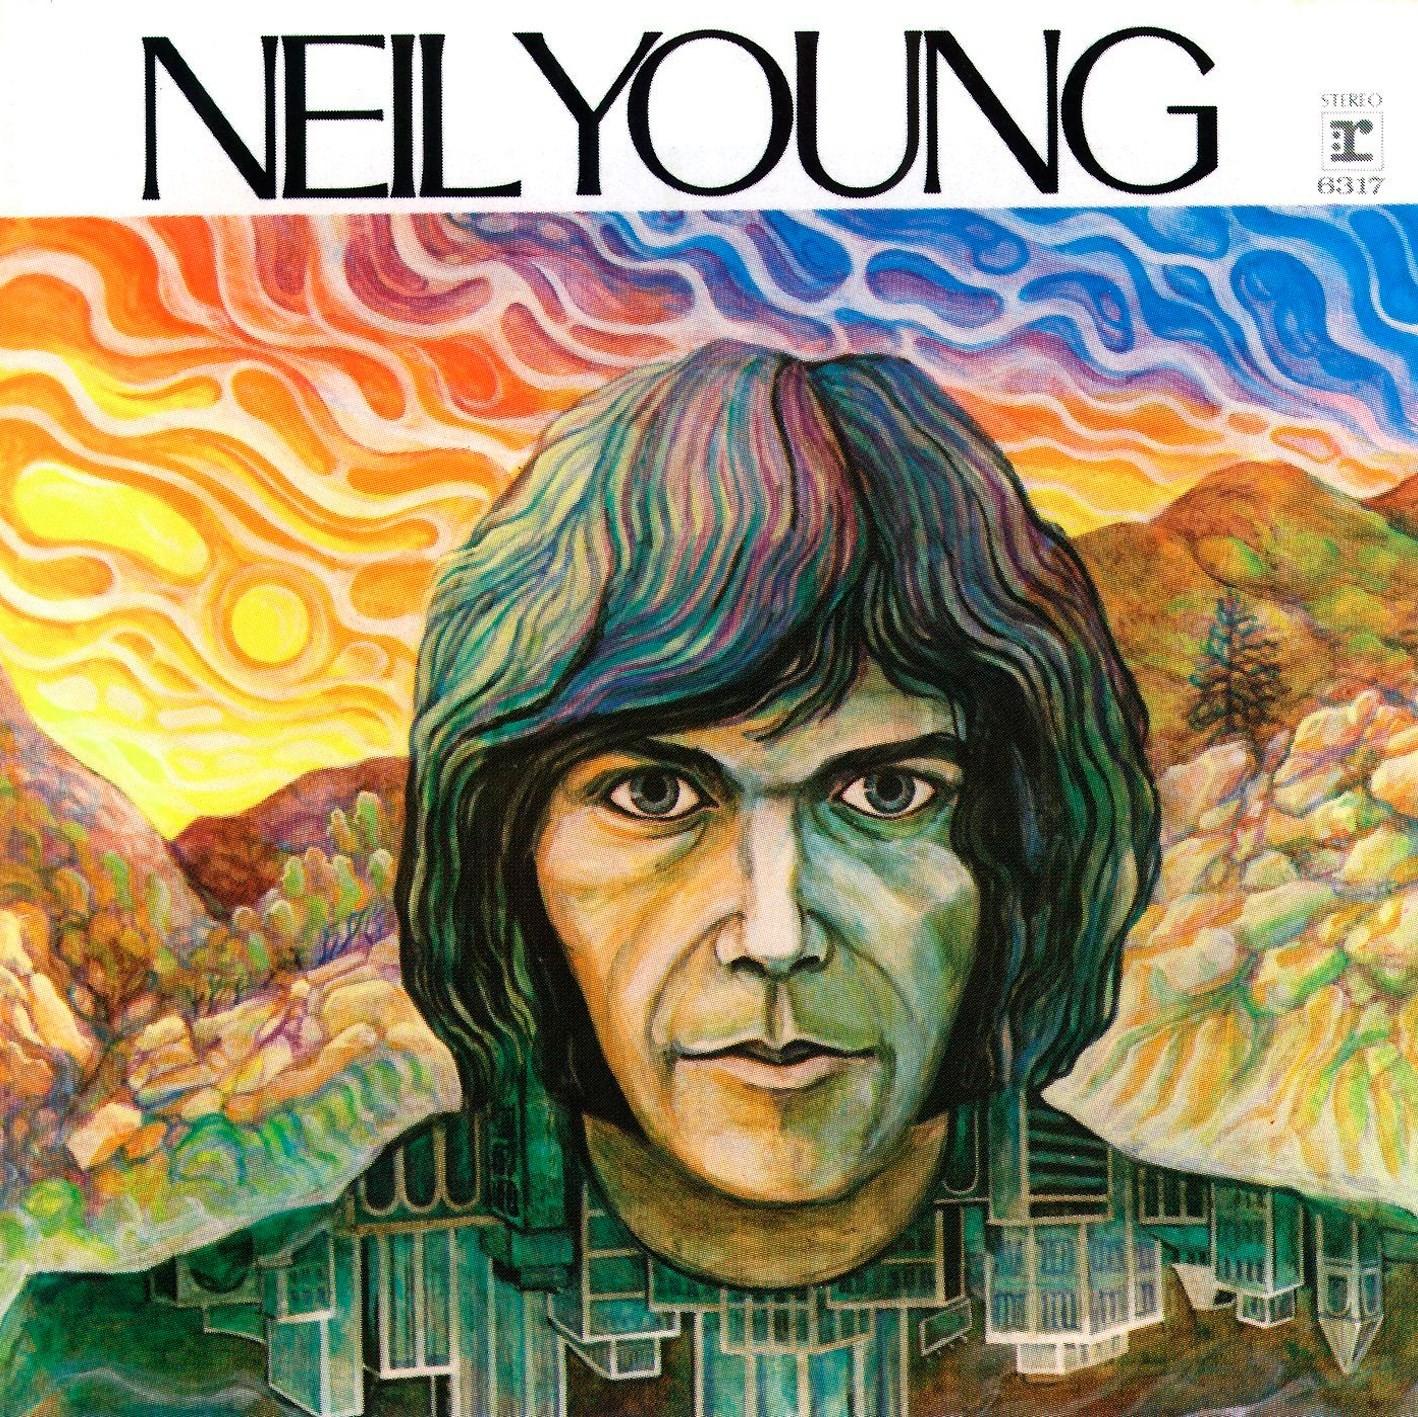 Buffalo Springfield:Mr. Soul Lyrics